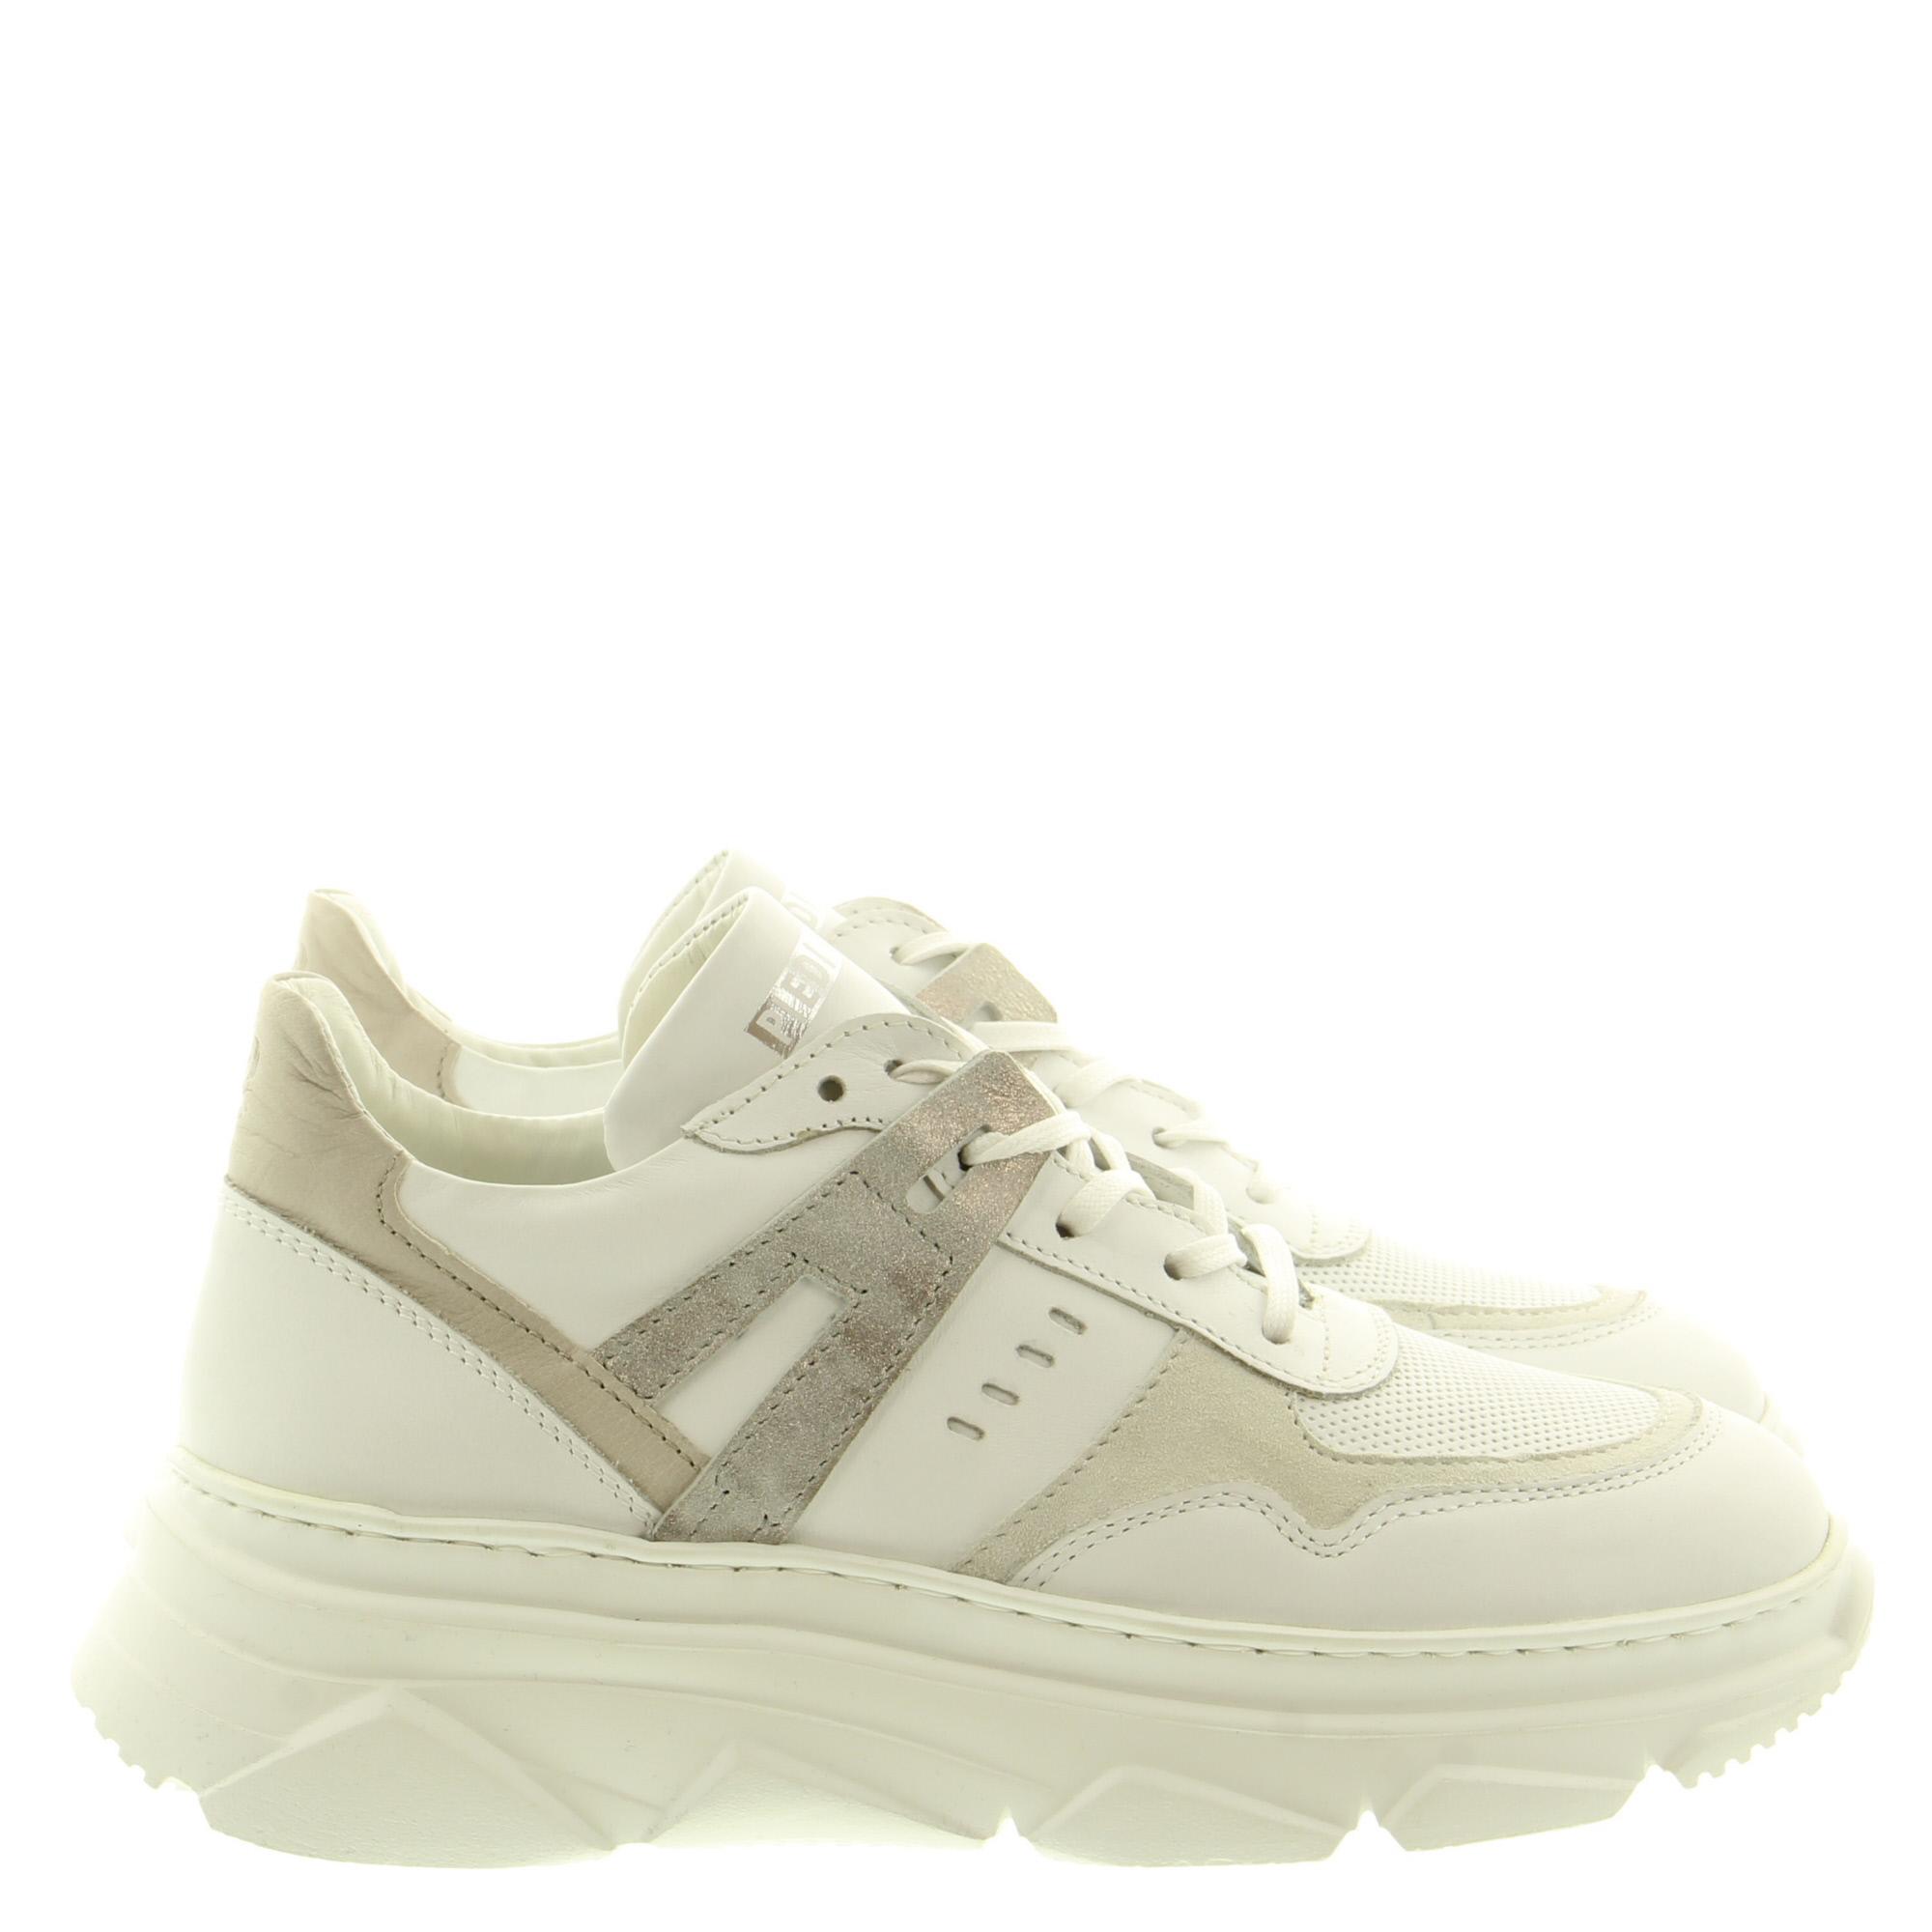 Piedi Nudi M42104-101PN Bianco 101 0001